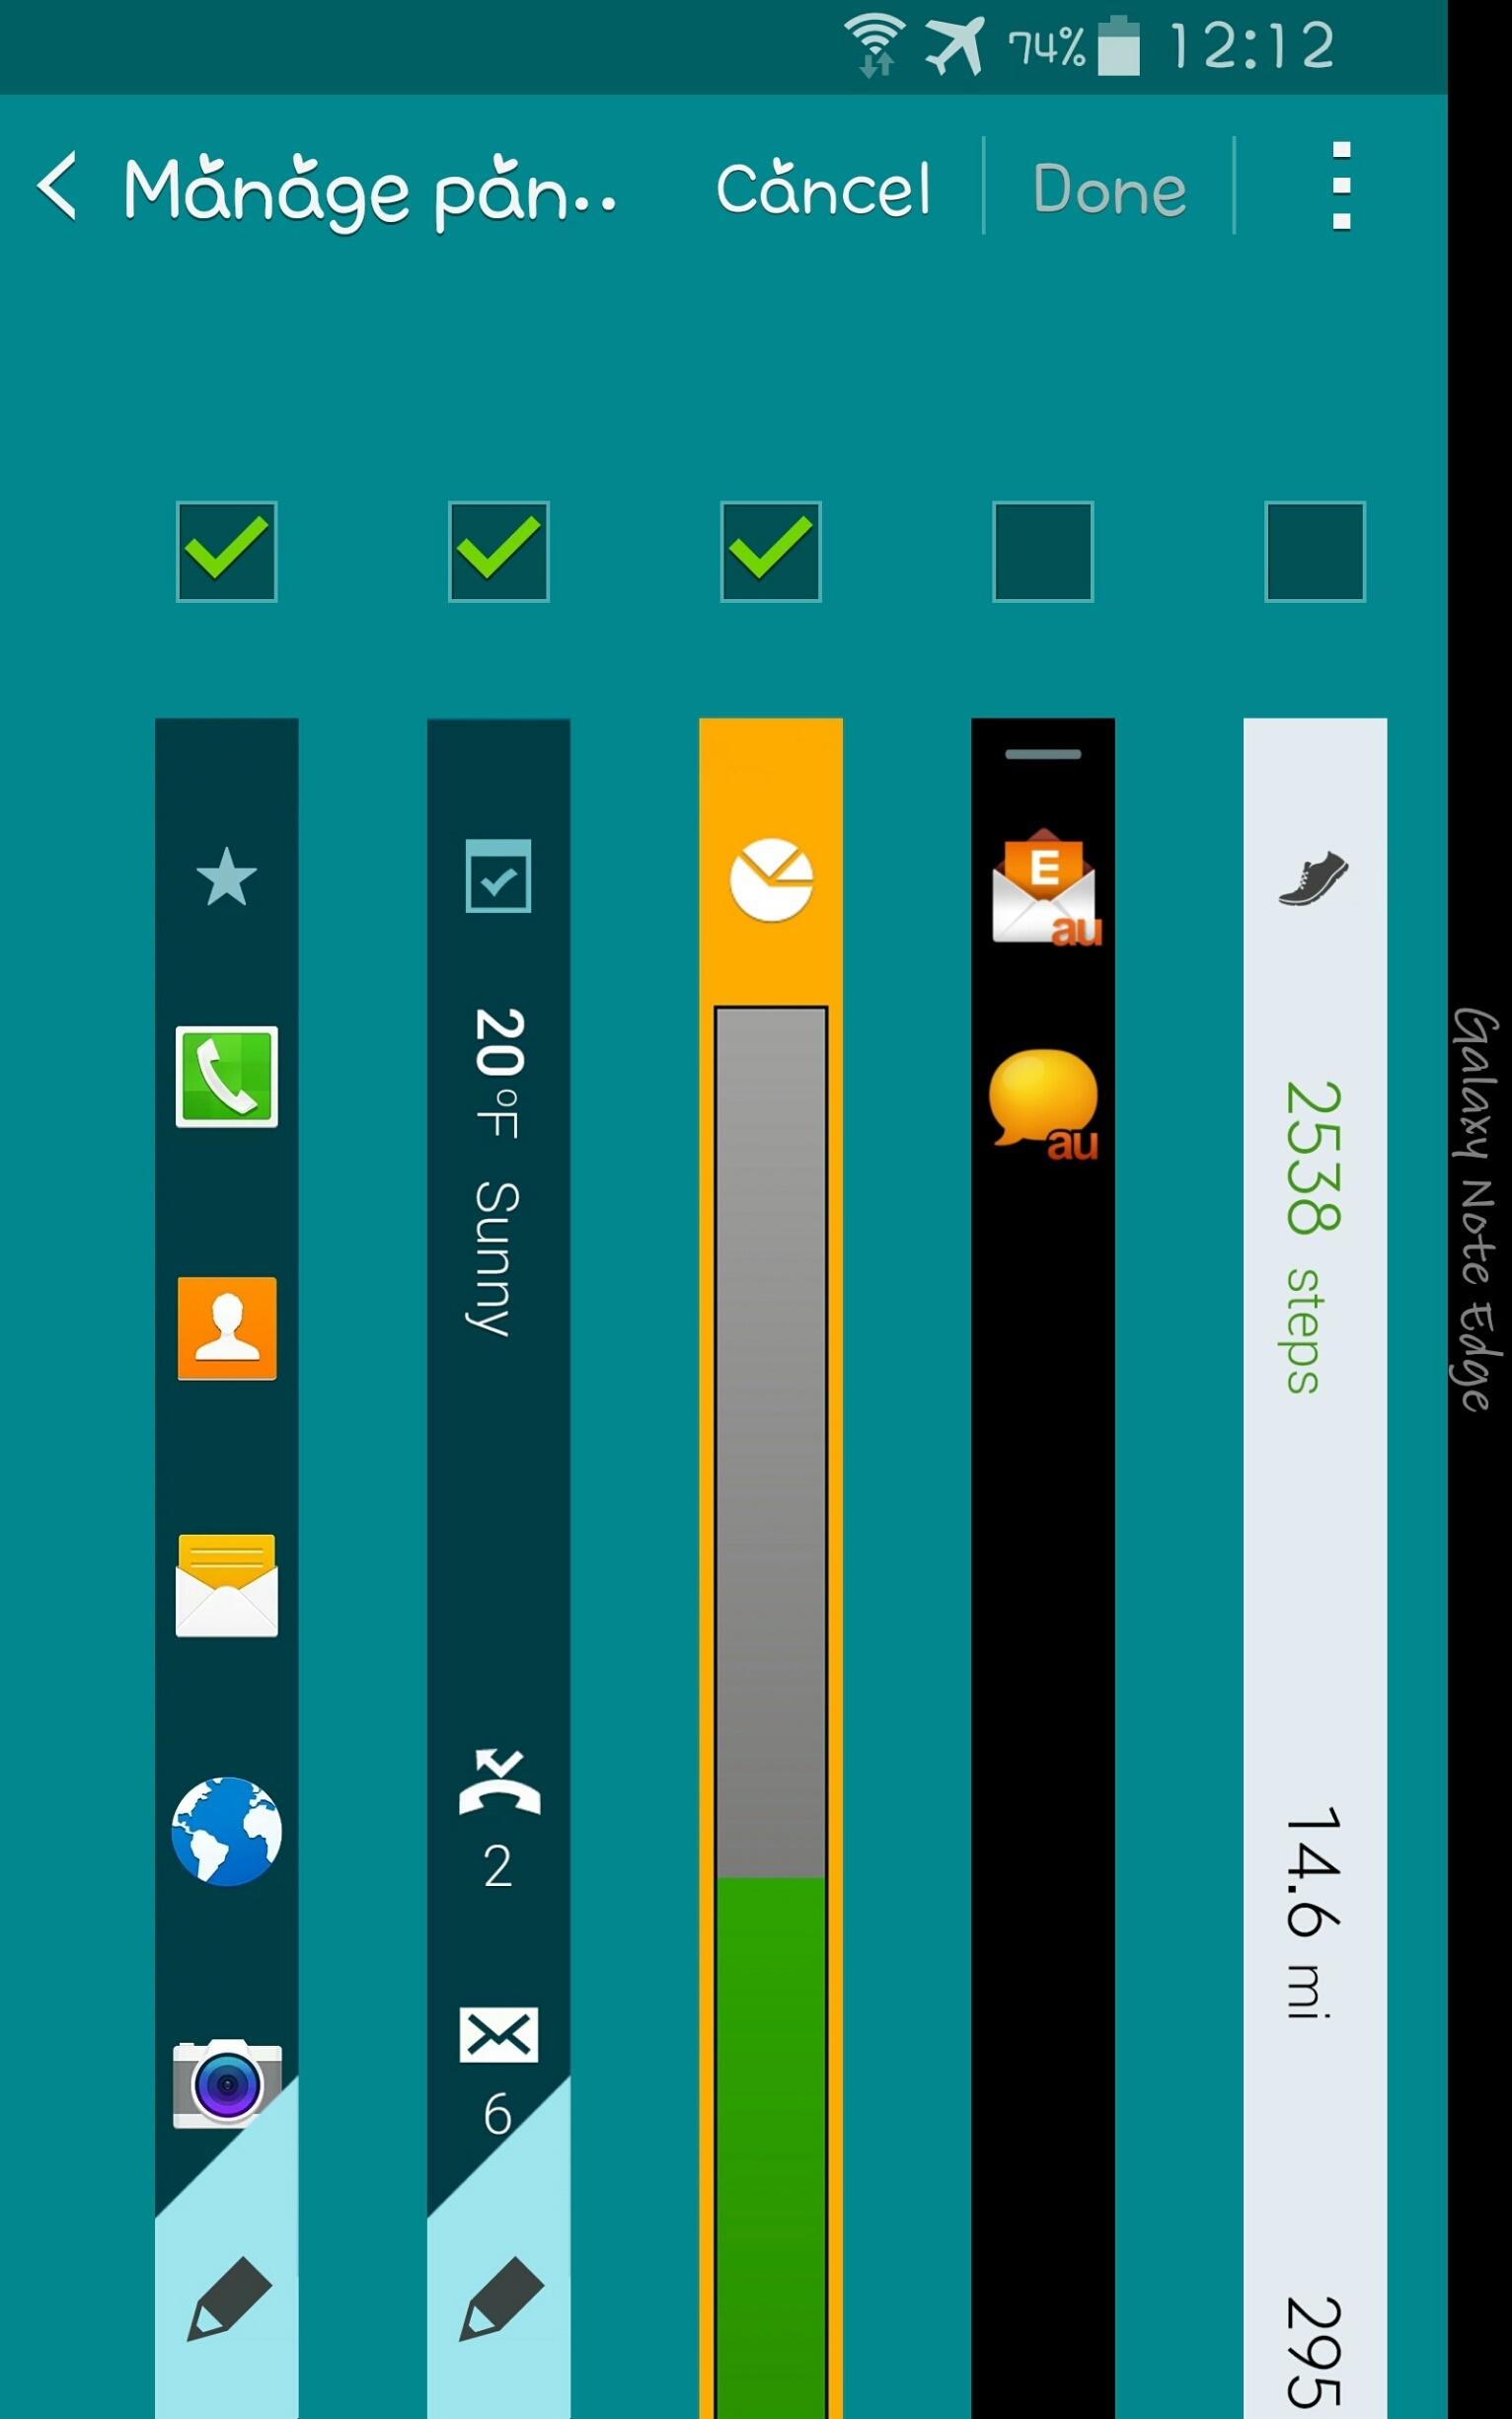 Samsung Galaxy Note Edge Software-11